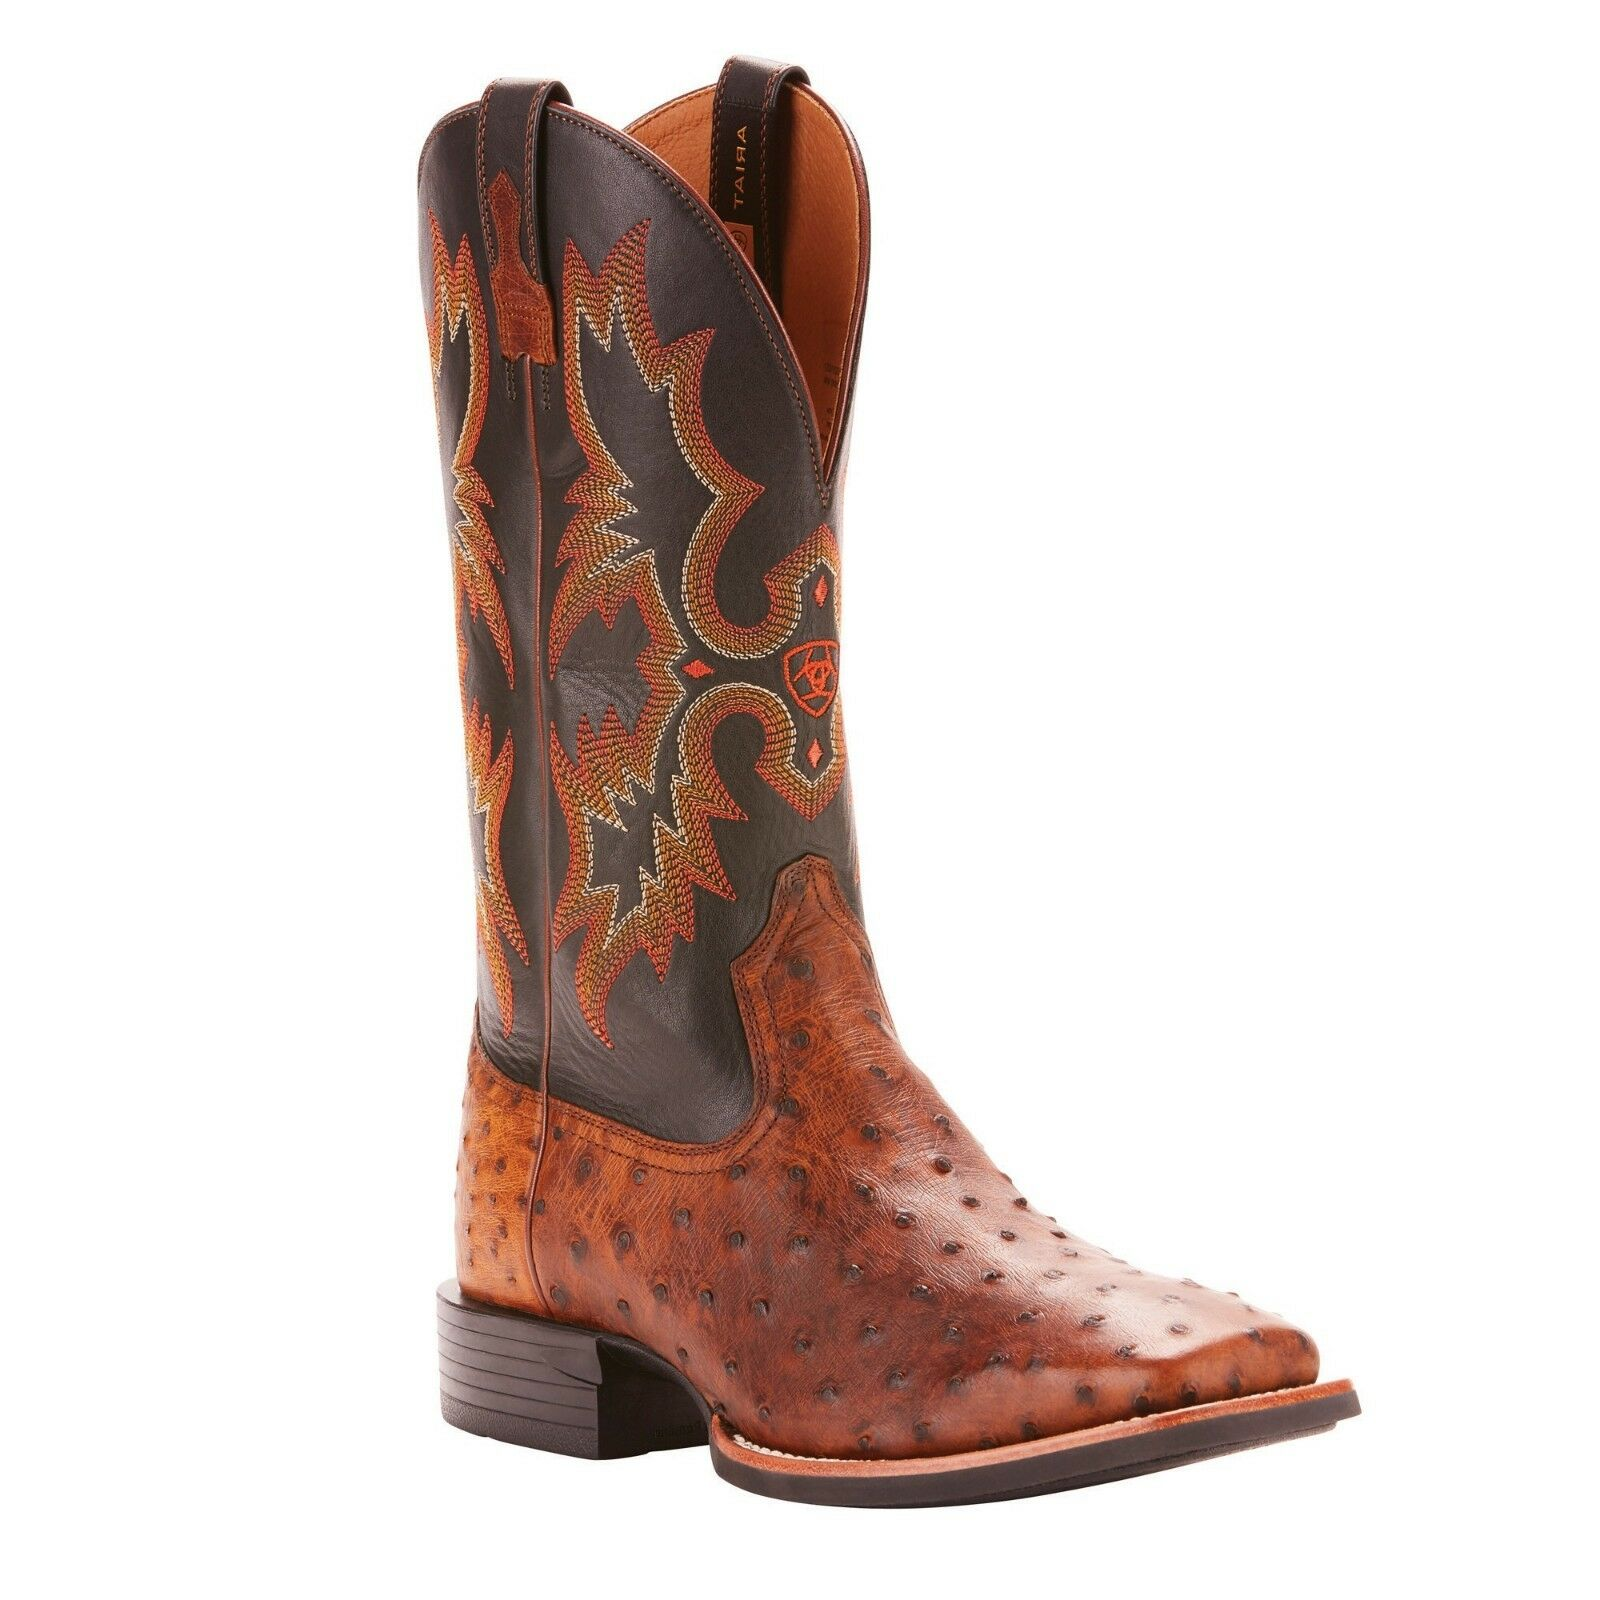 Ariat® Men's Quantum Classic Brown Full Quill Ostrich Boots 10025102